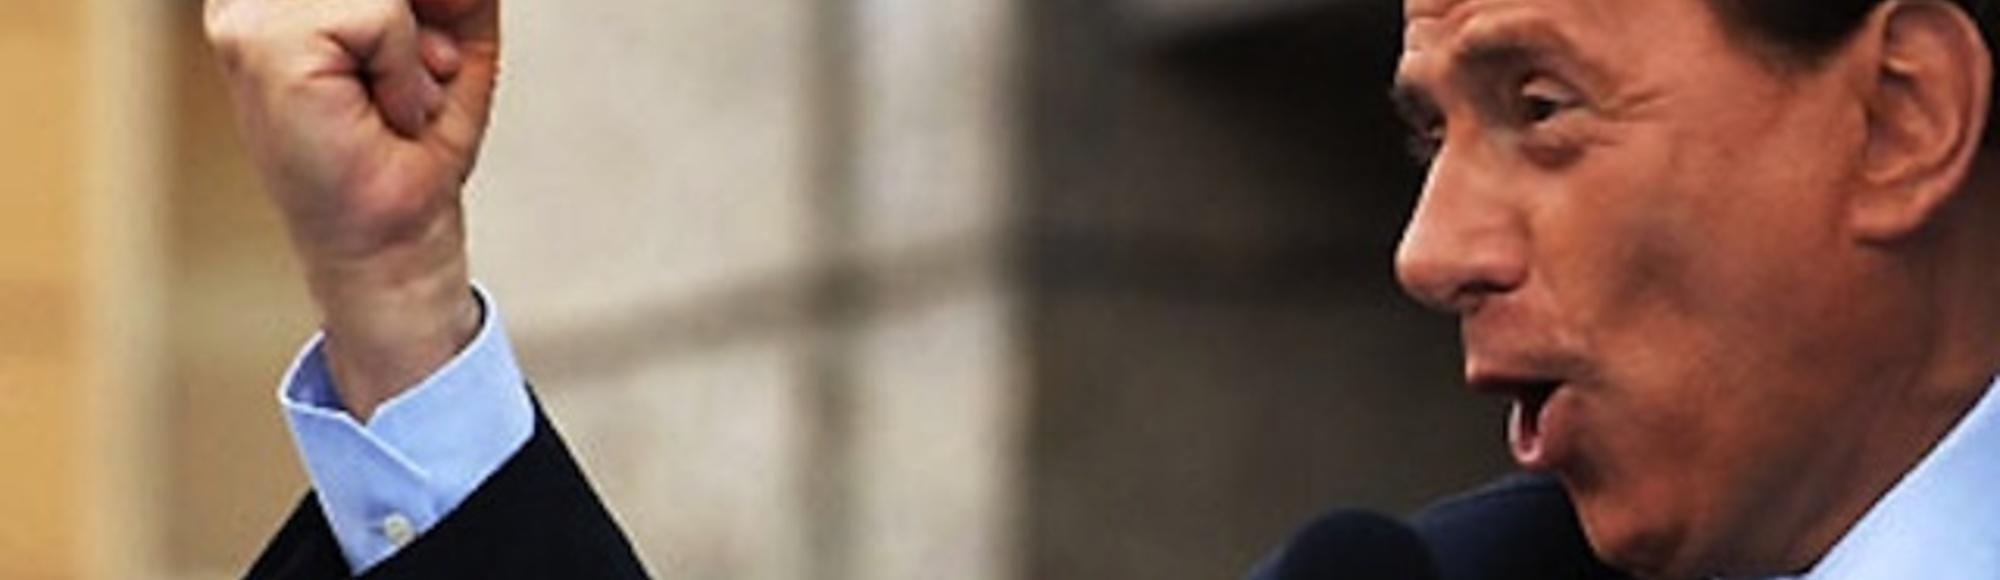 Did Berlusconi Buy Balotelli to Help His Election Bid?